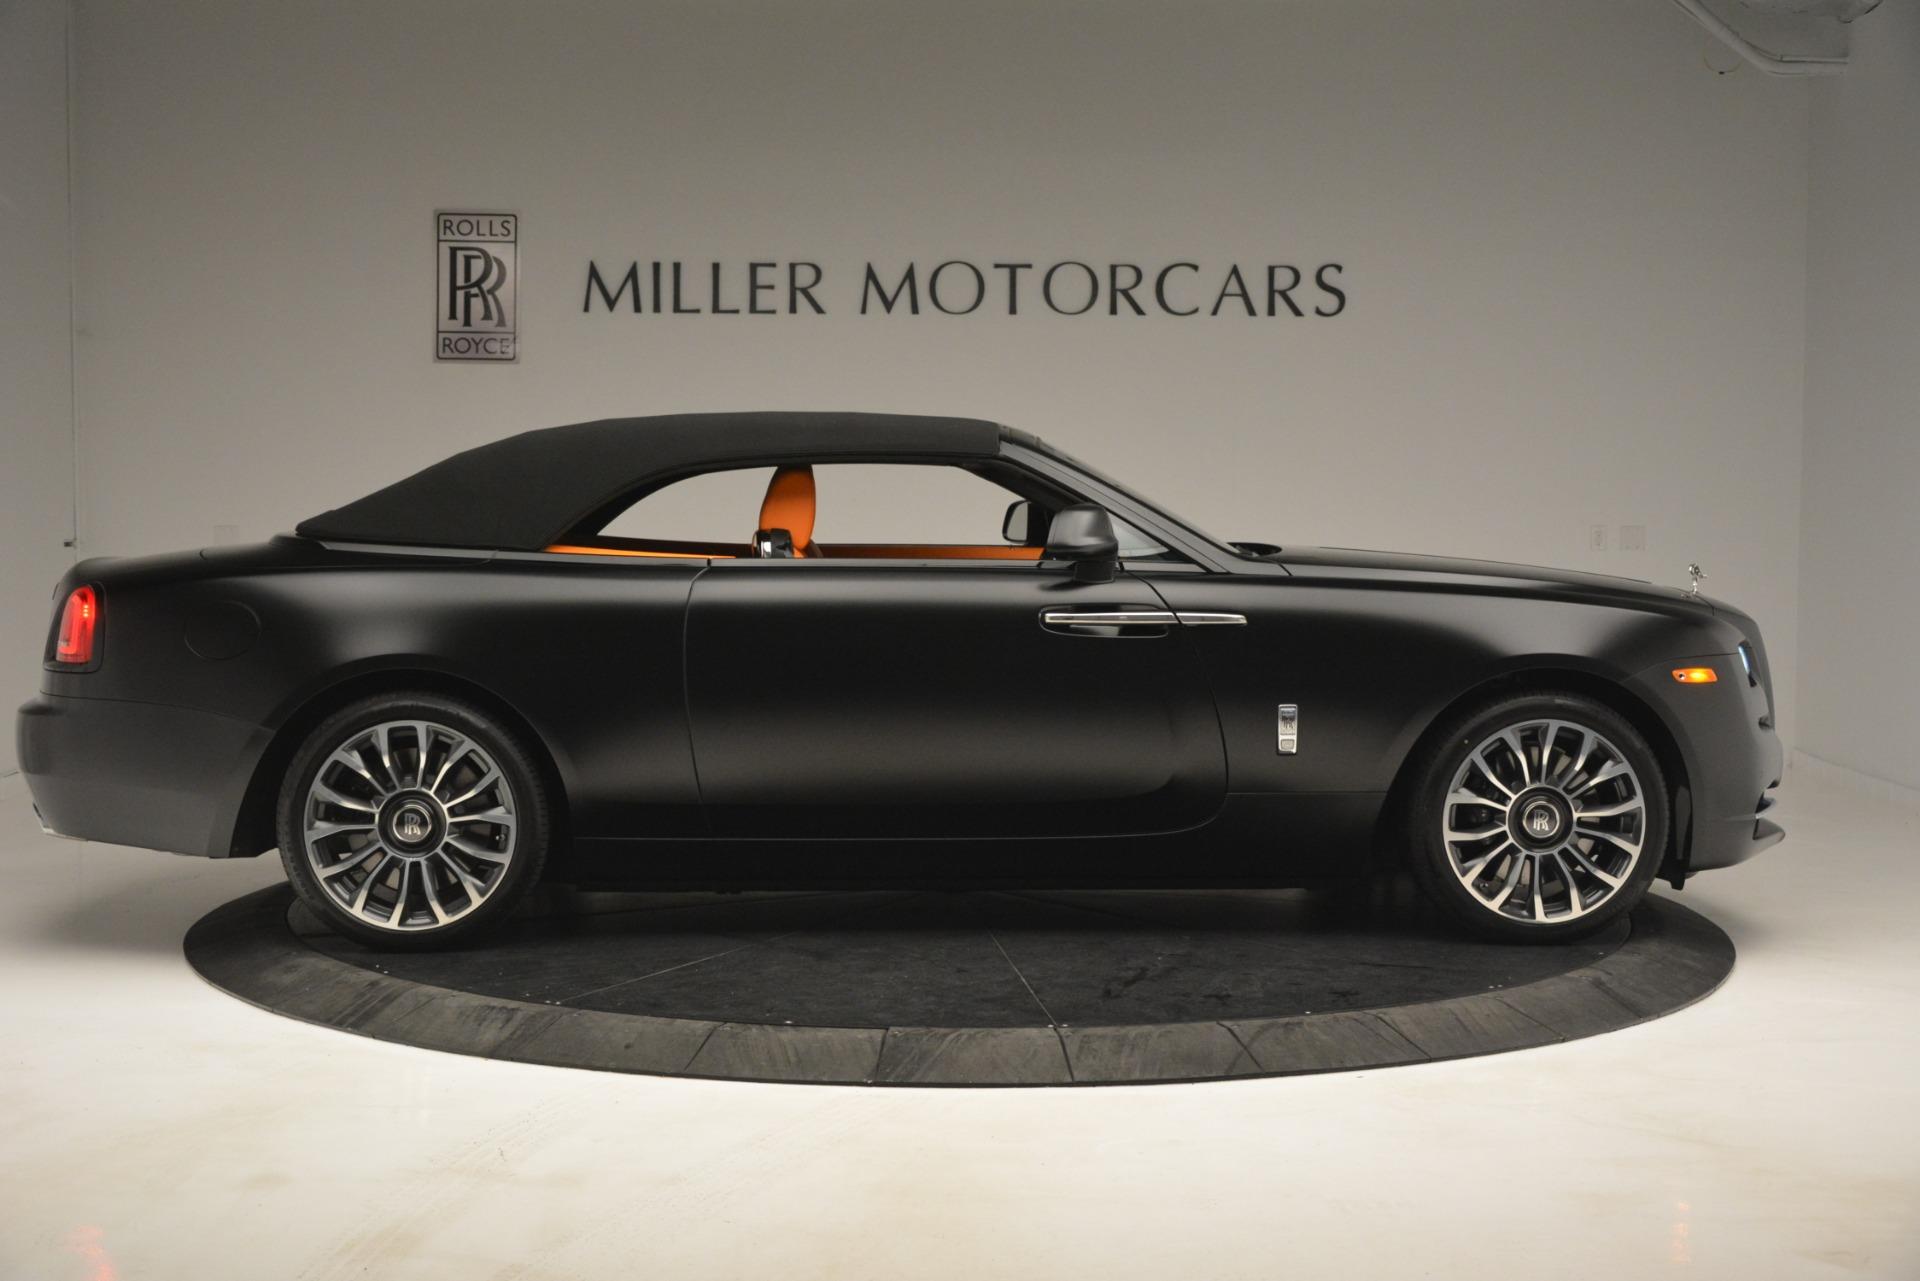 New 2019 Rolls-Royce Dawn  For Sale In Greenwich, CT 2695_p23